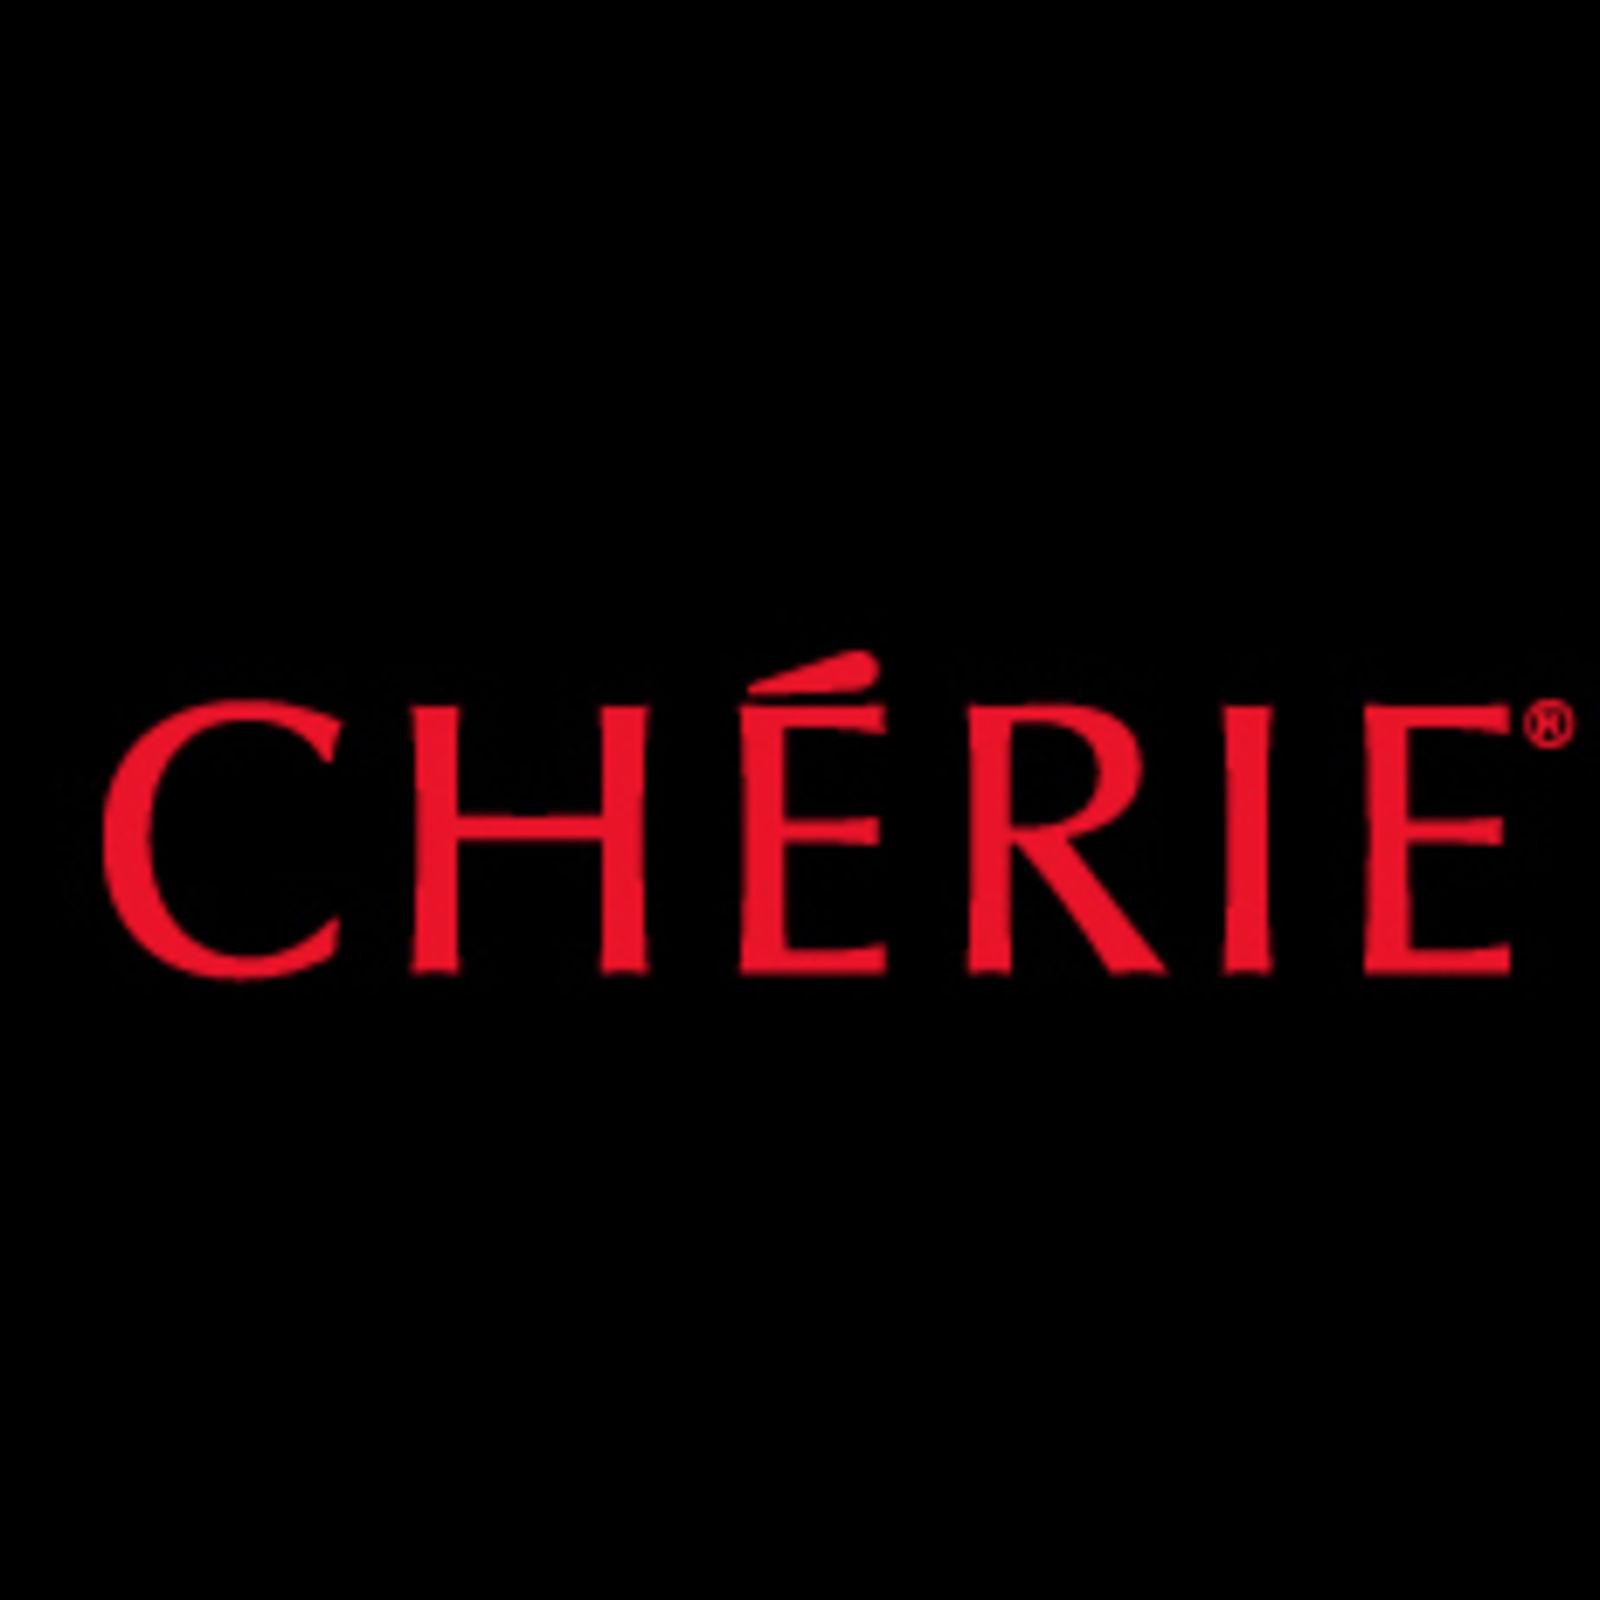 CHÉRIE